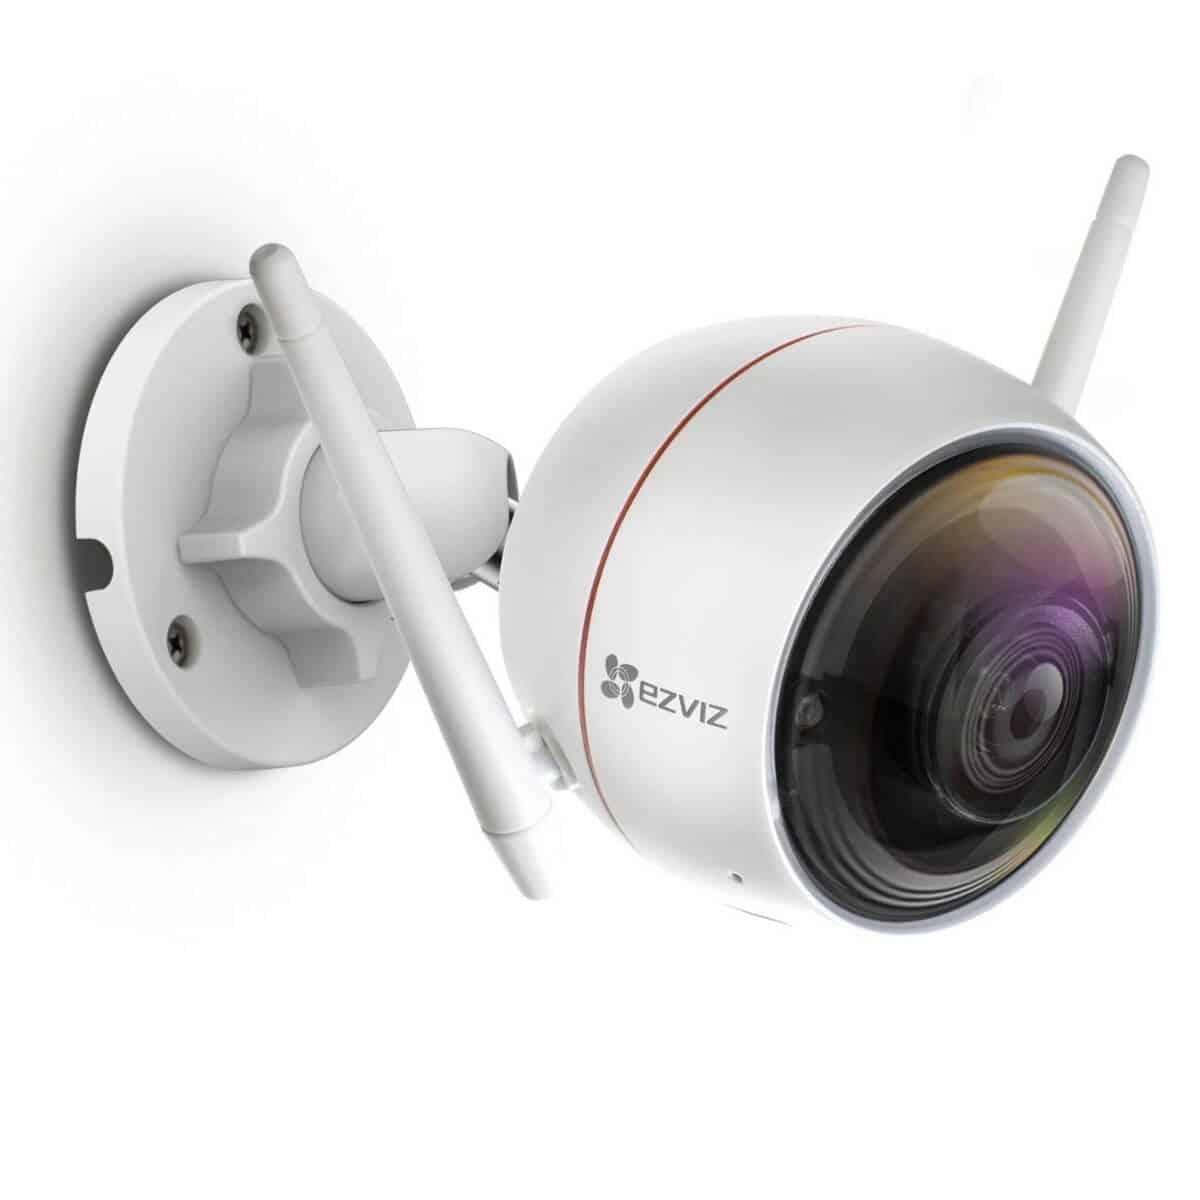 Ezviz security camera mounted to a wall.